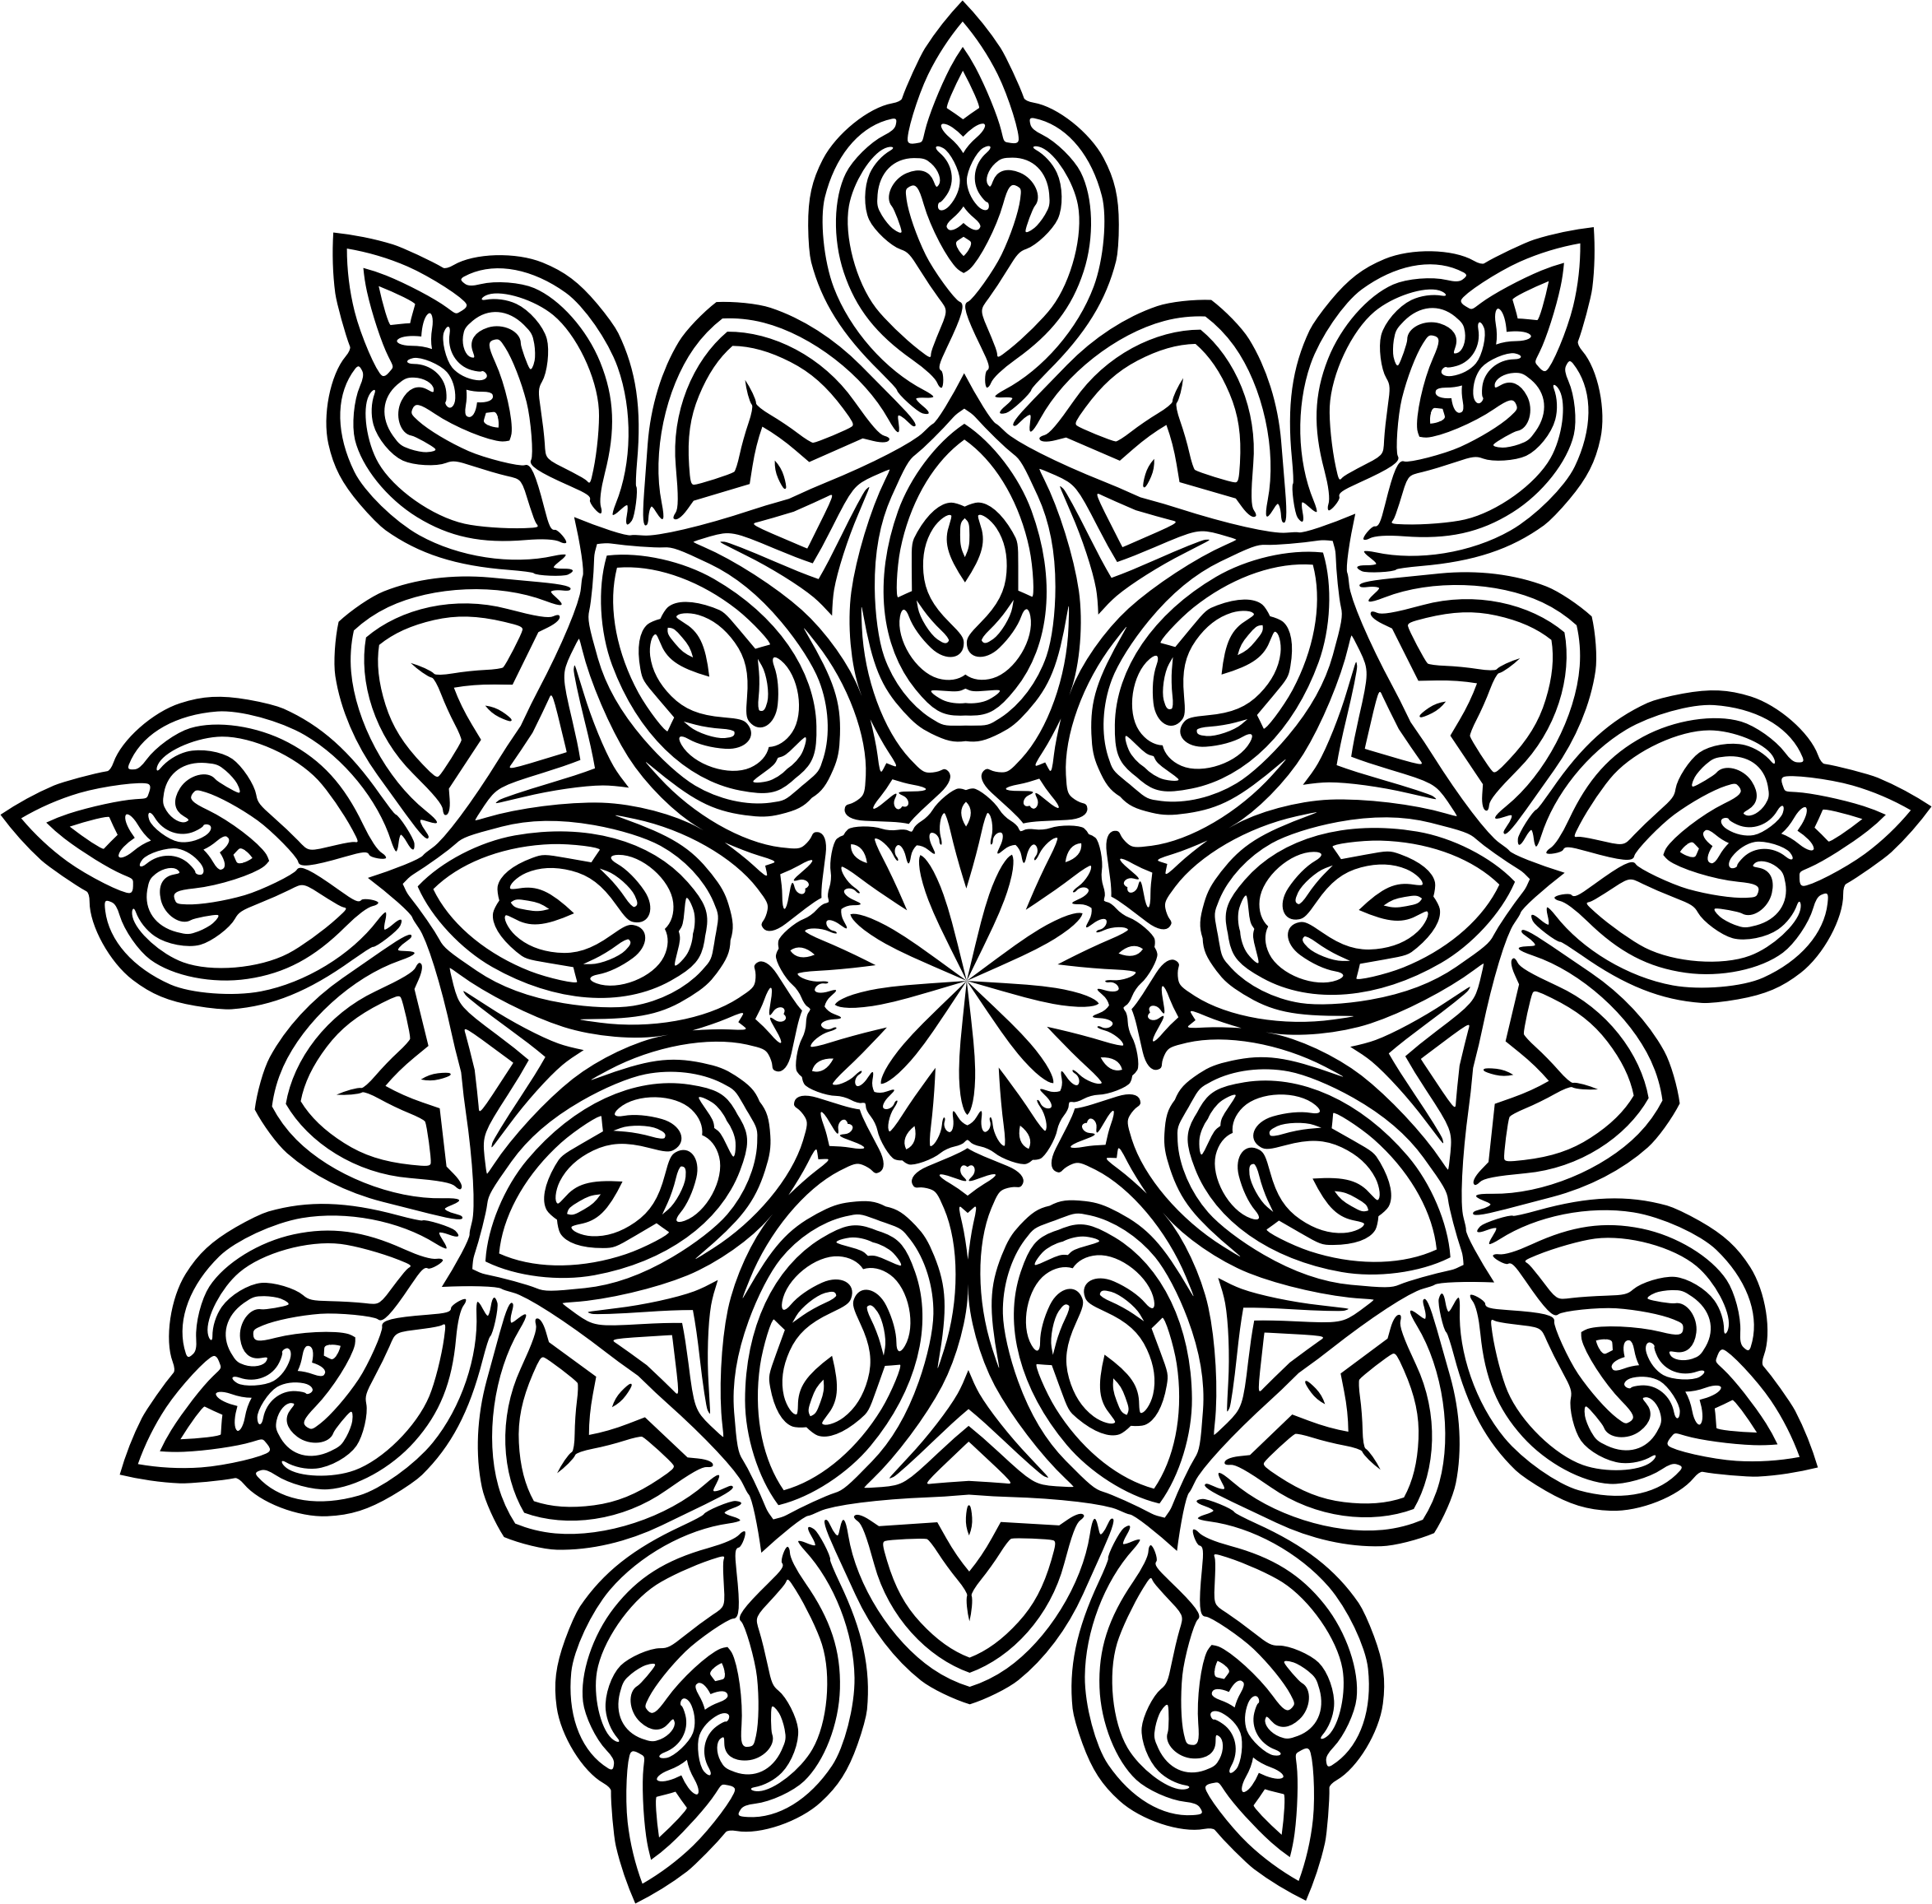 Symetric clipground geometric. Design clipart vector